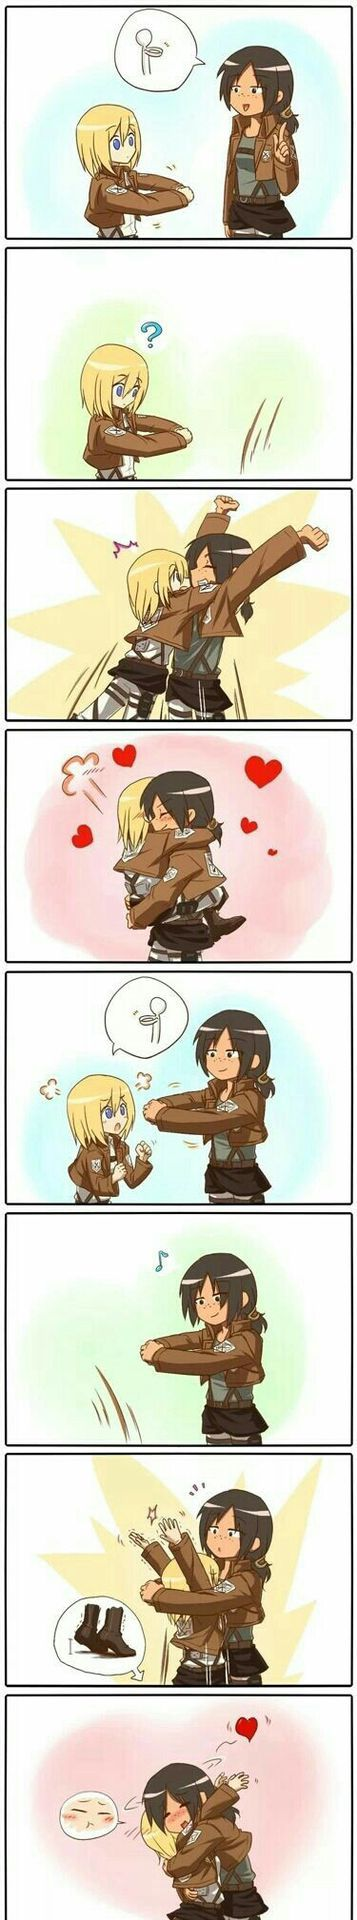 Komiksy- Yuri